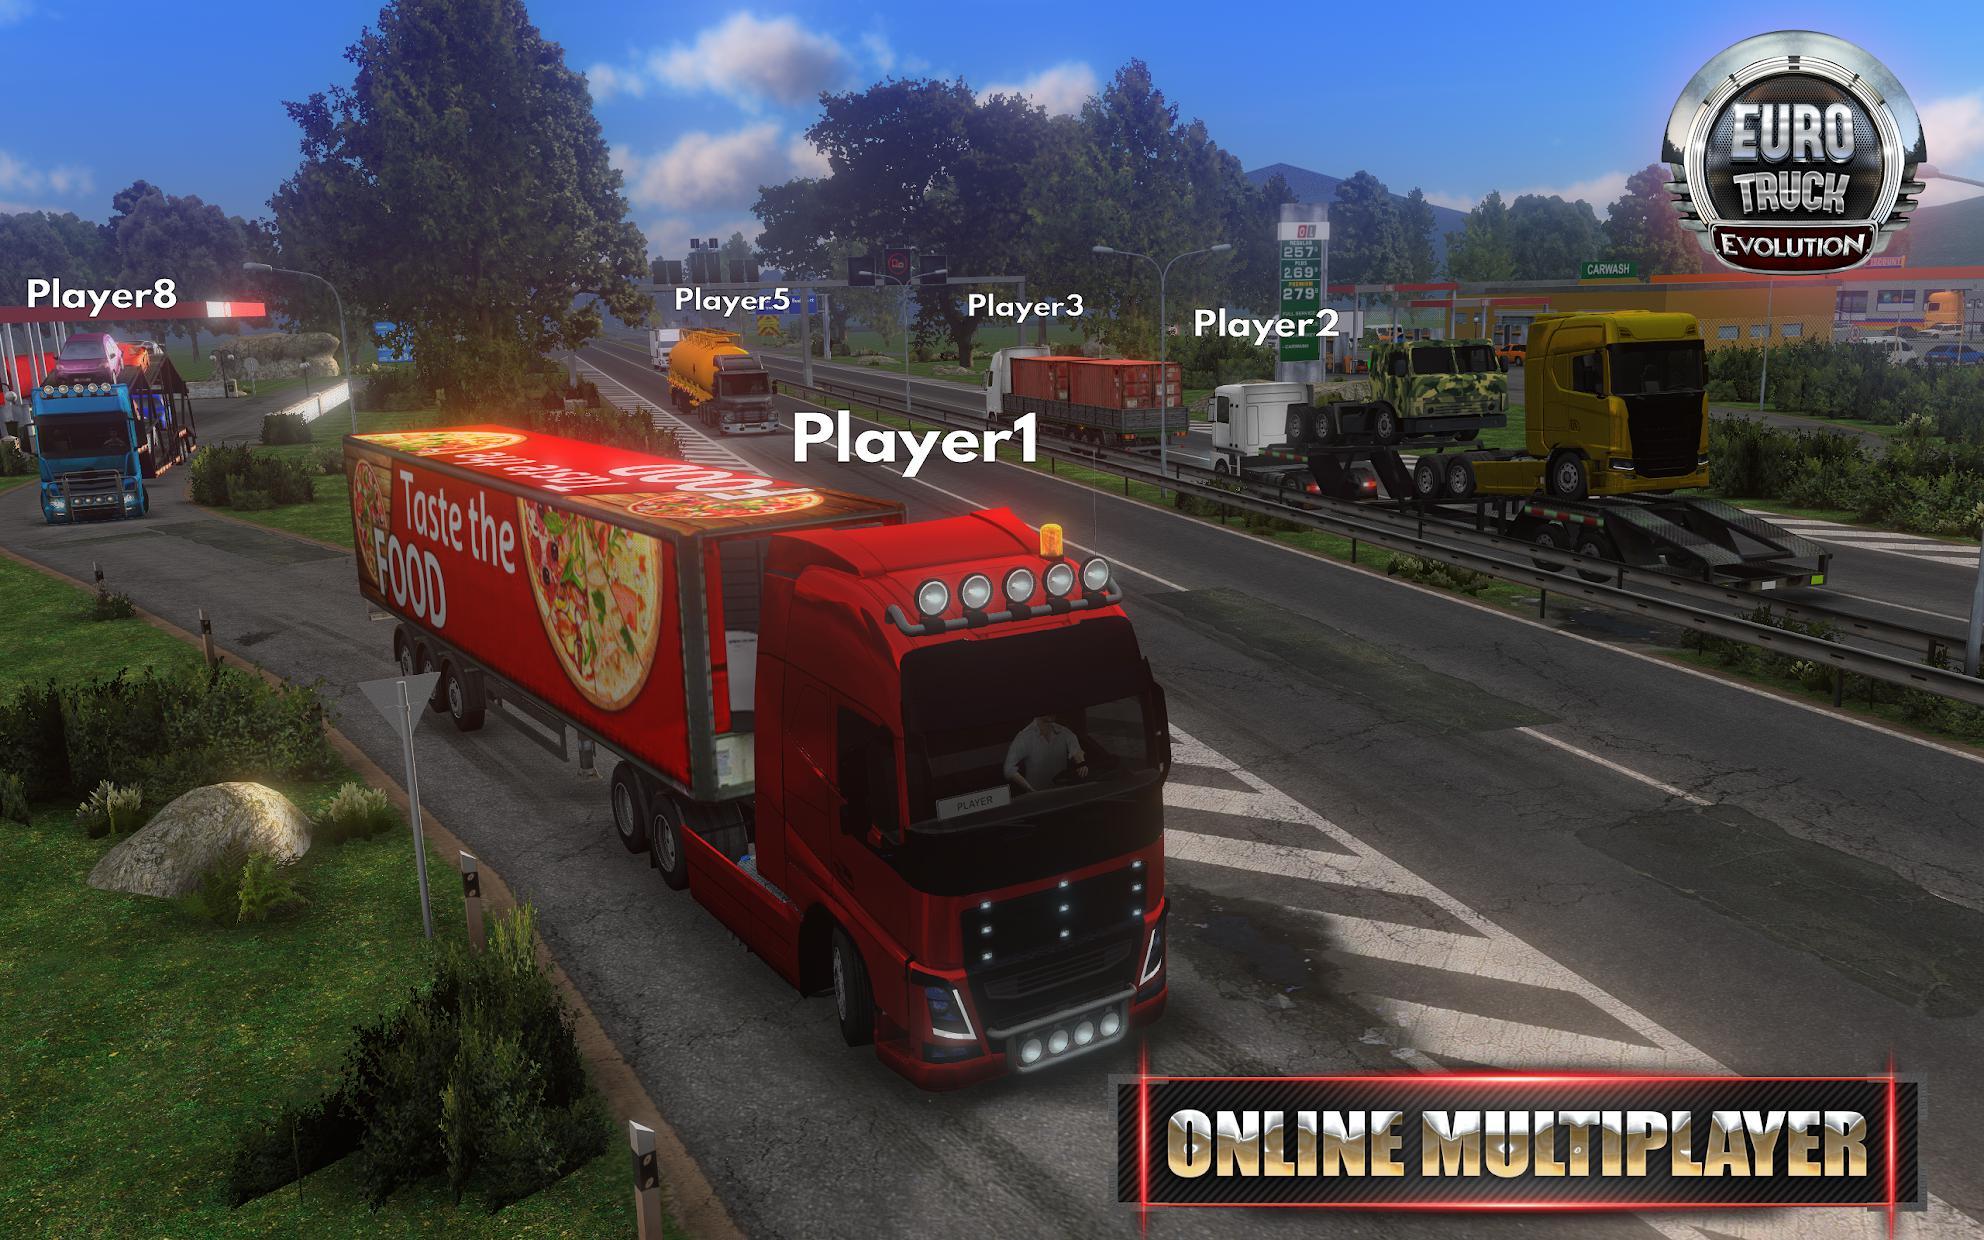 Euro Truck Evolution (Simulator)无法连接服务器如何解决